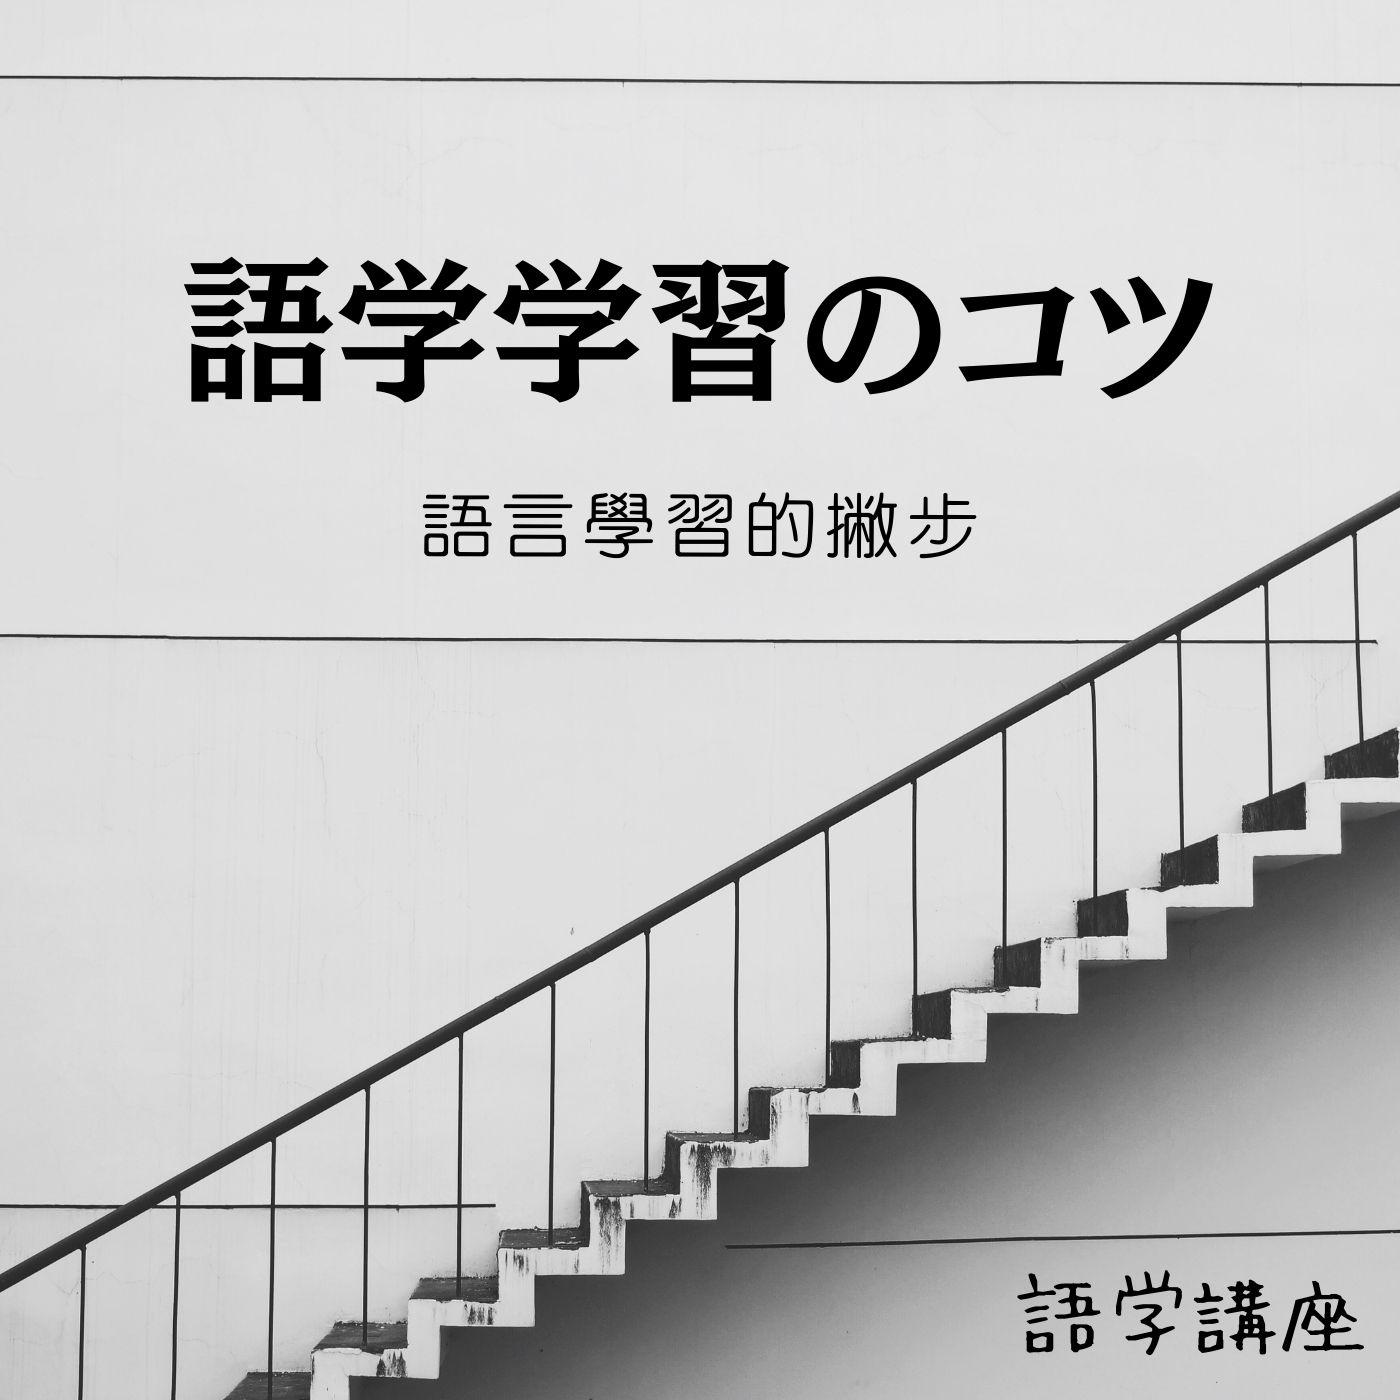 EP5 - (JP/CH)【語学講座】4つの語学学習のコツ/4個語言學習的撇步